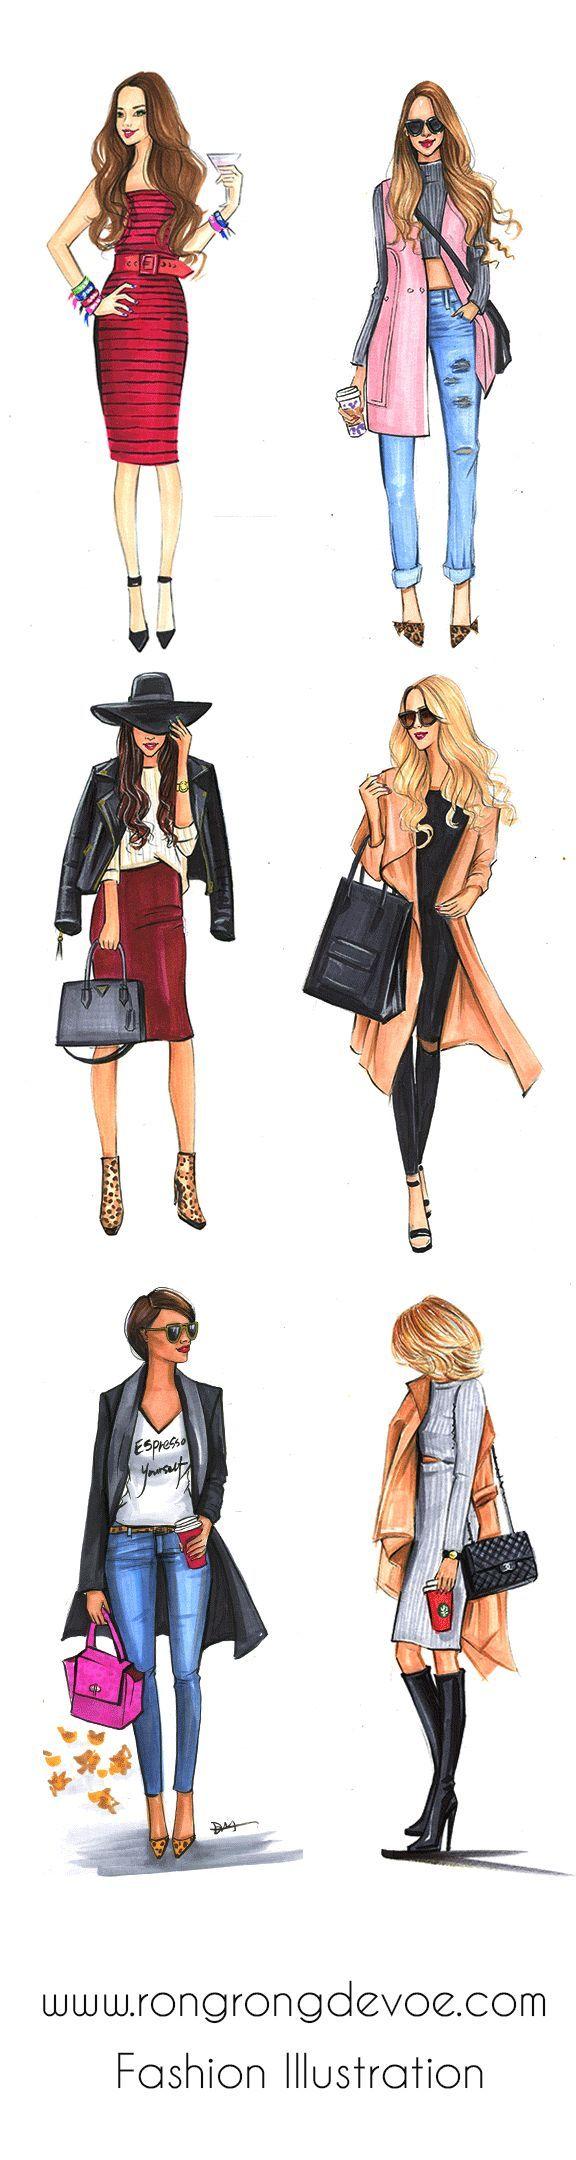 Photo of Fashion illustrations of street style fashionistas by Houston fashion illustrato…